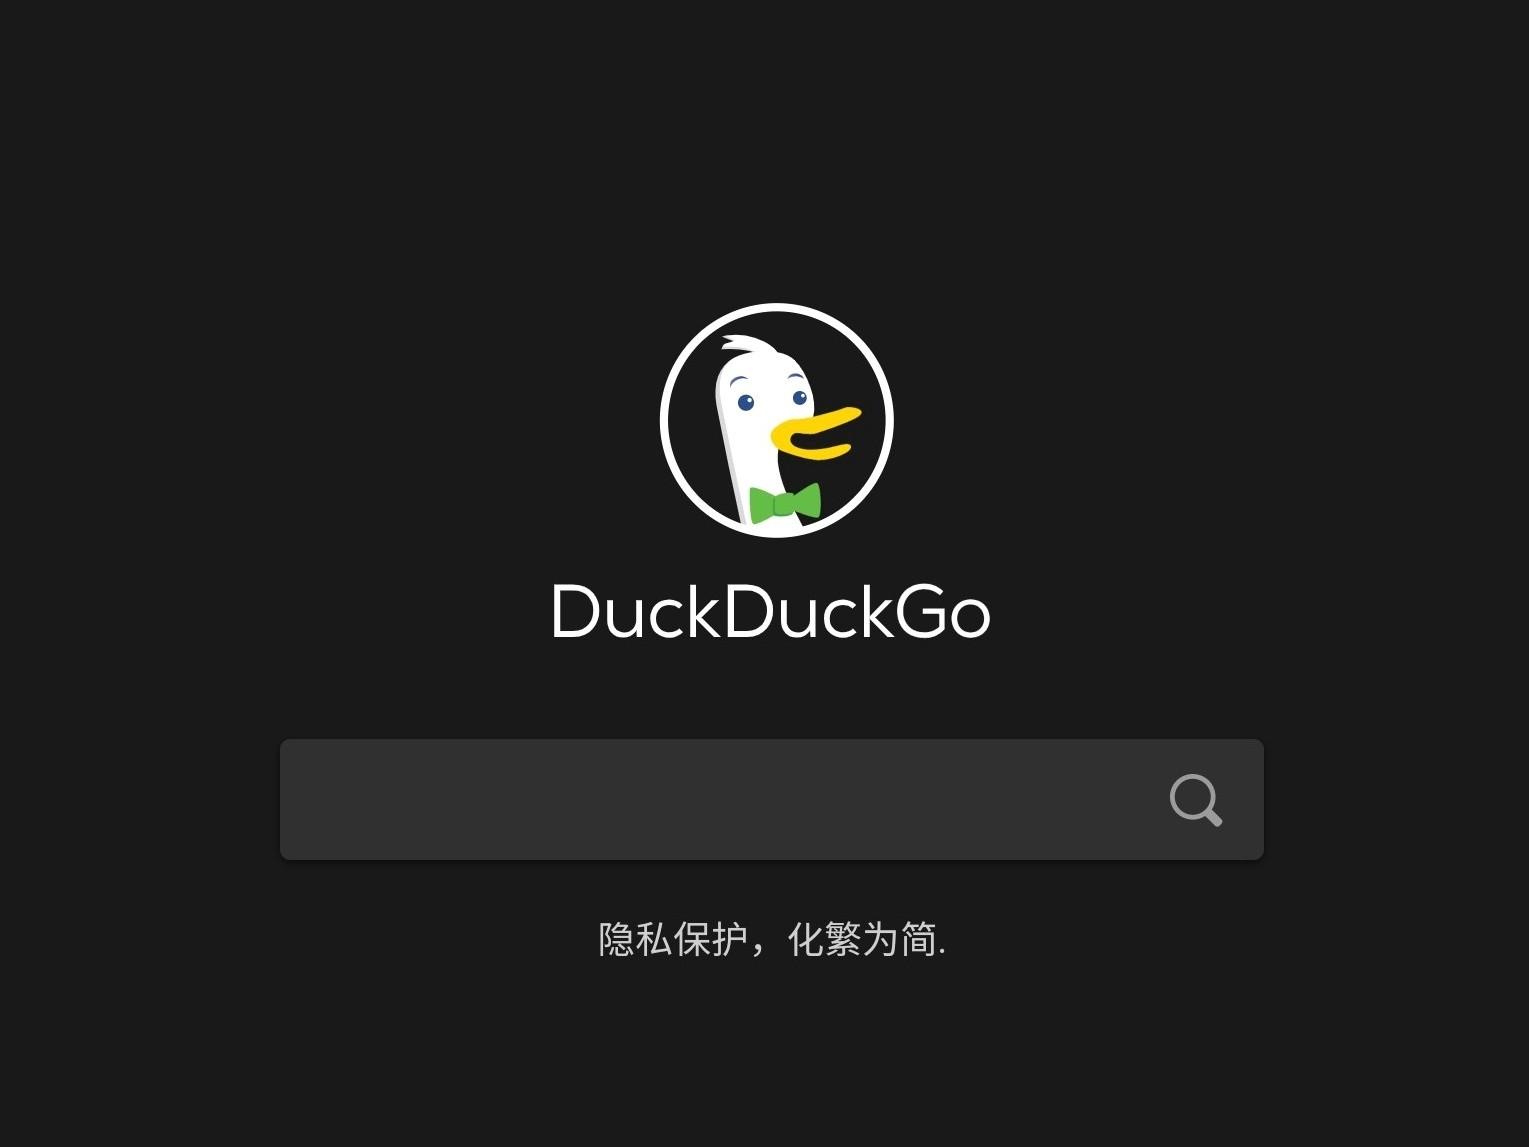 Google人机身份验证受害者?不如试试 DuckDuckGo